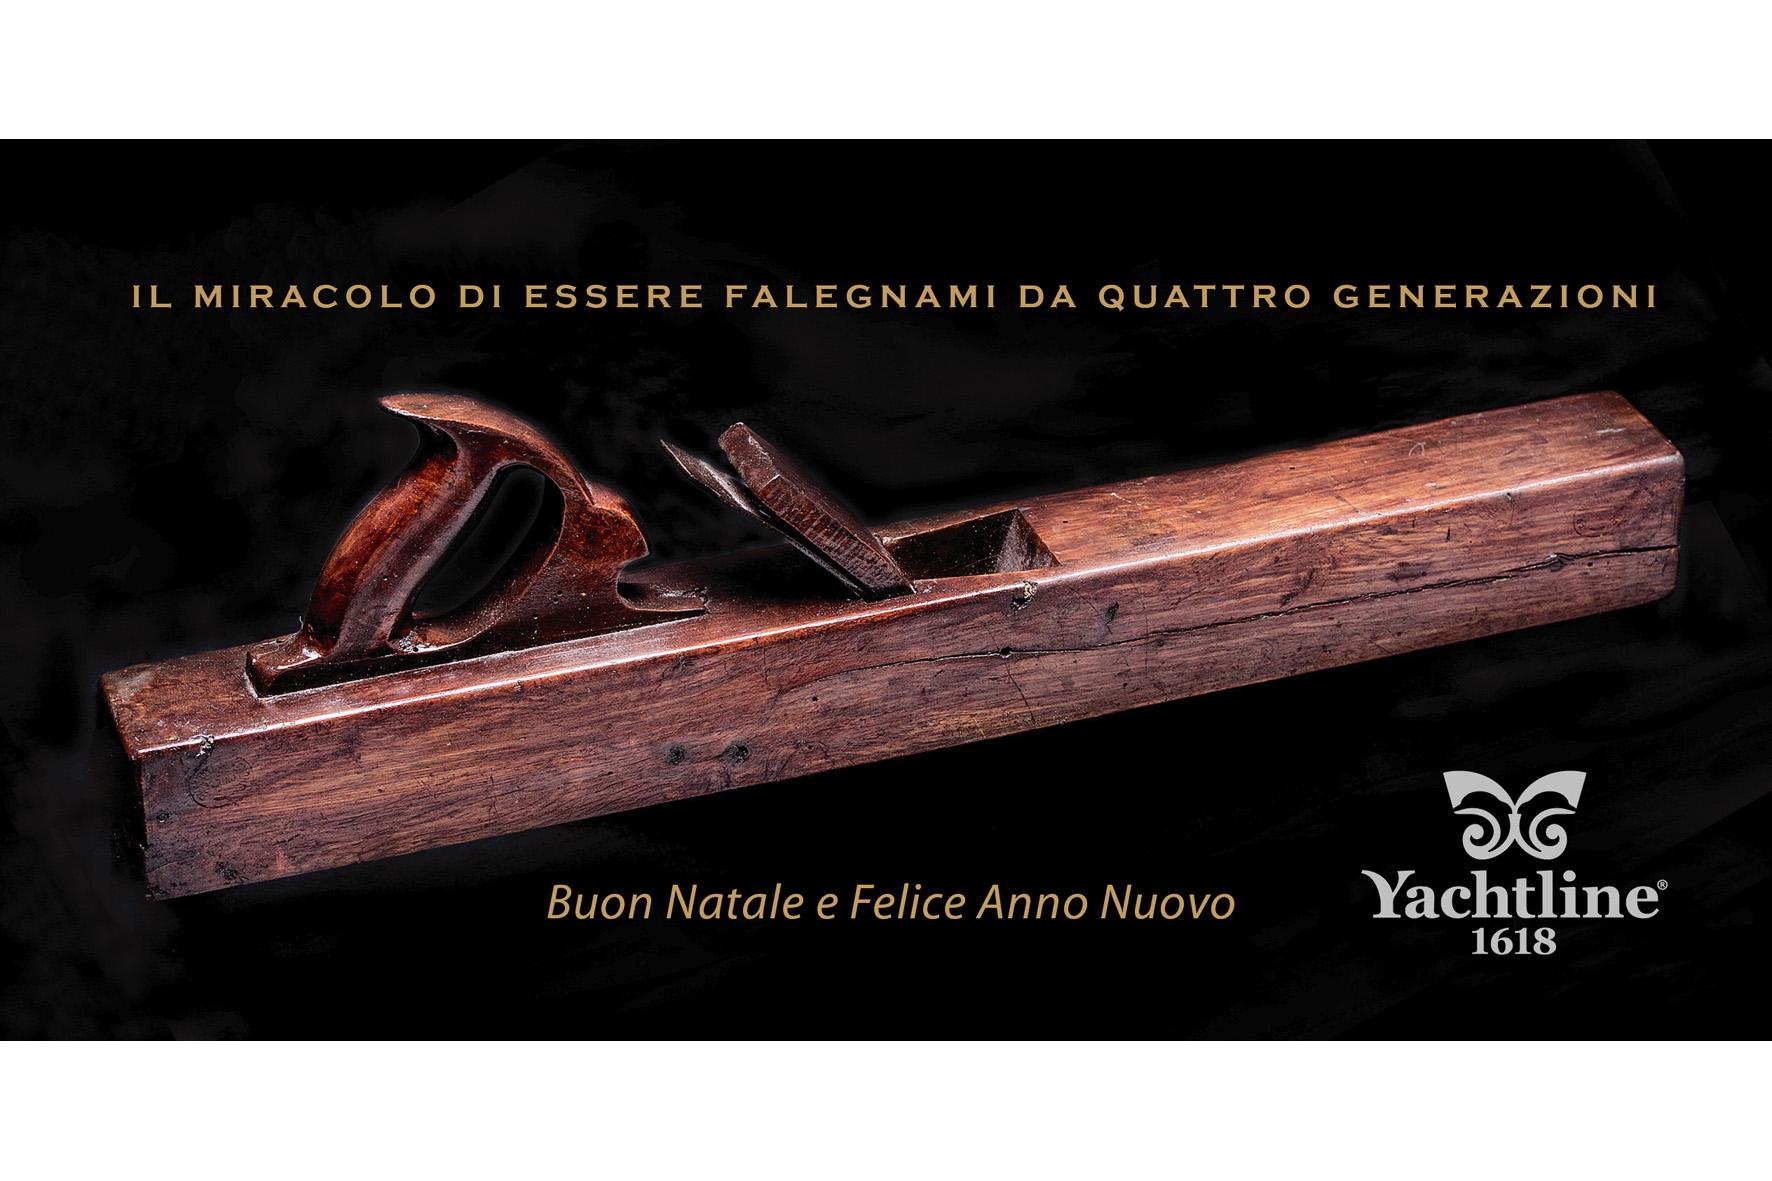 Yachtline1618-auguri-miracolo-falegnami